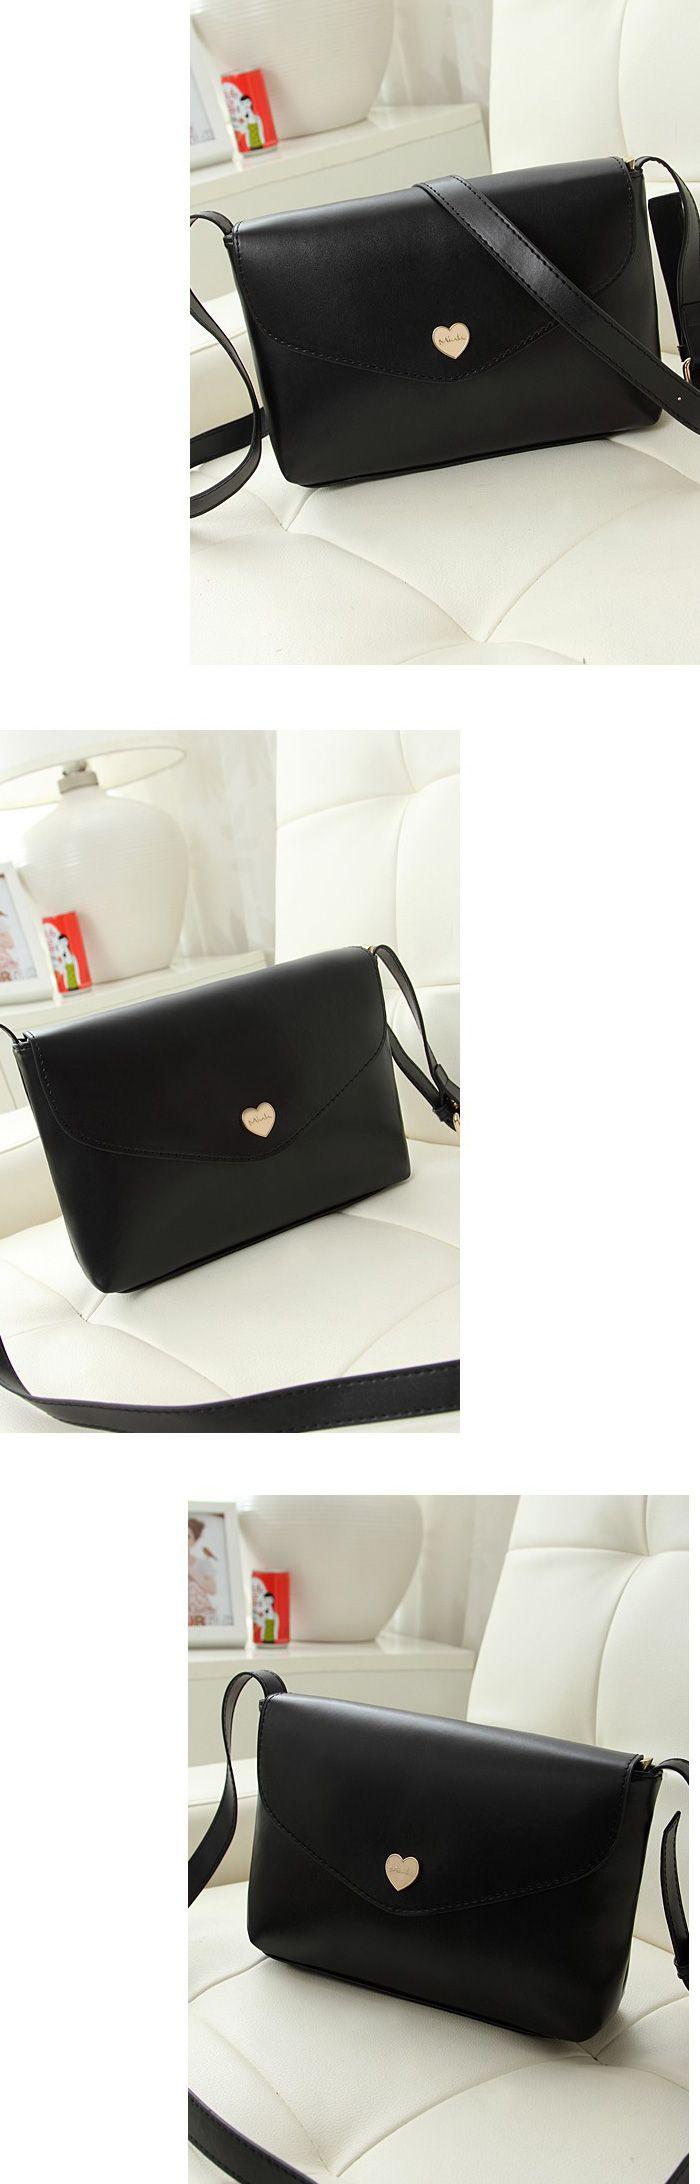 Refreshing Sweat Heart Buckle Crossbody Bag For Women, Shop online for $12.60 Cheap Crossbody Bags code 716850 - Eastclothes.com